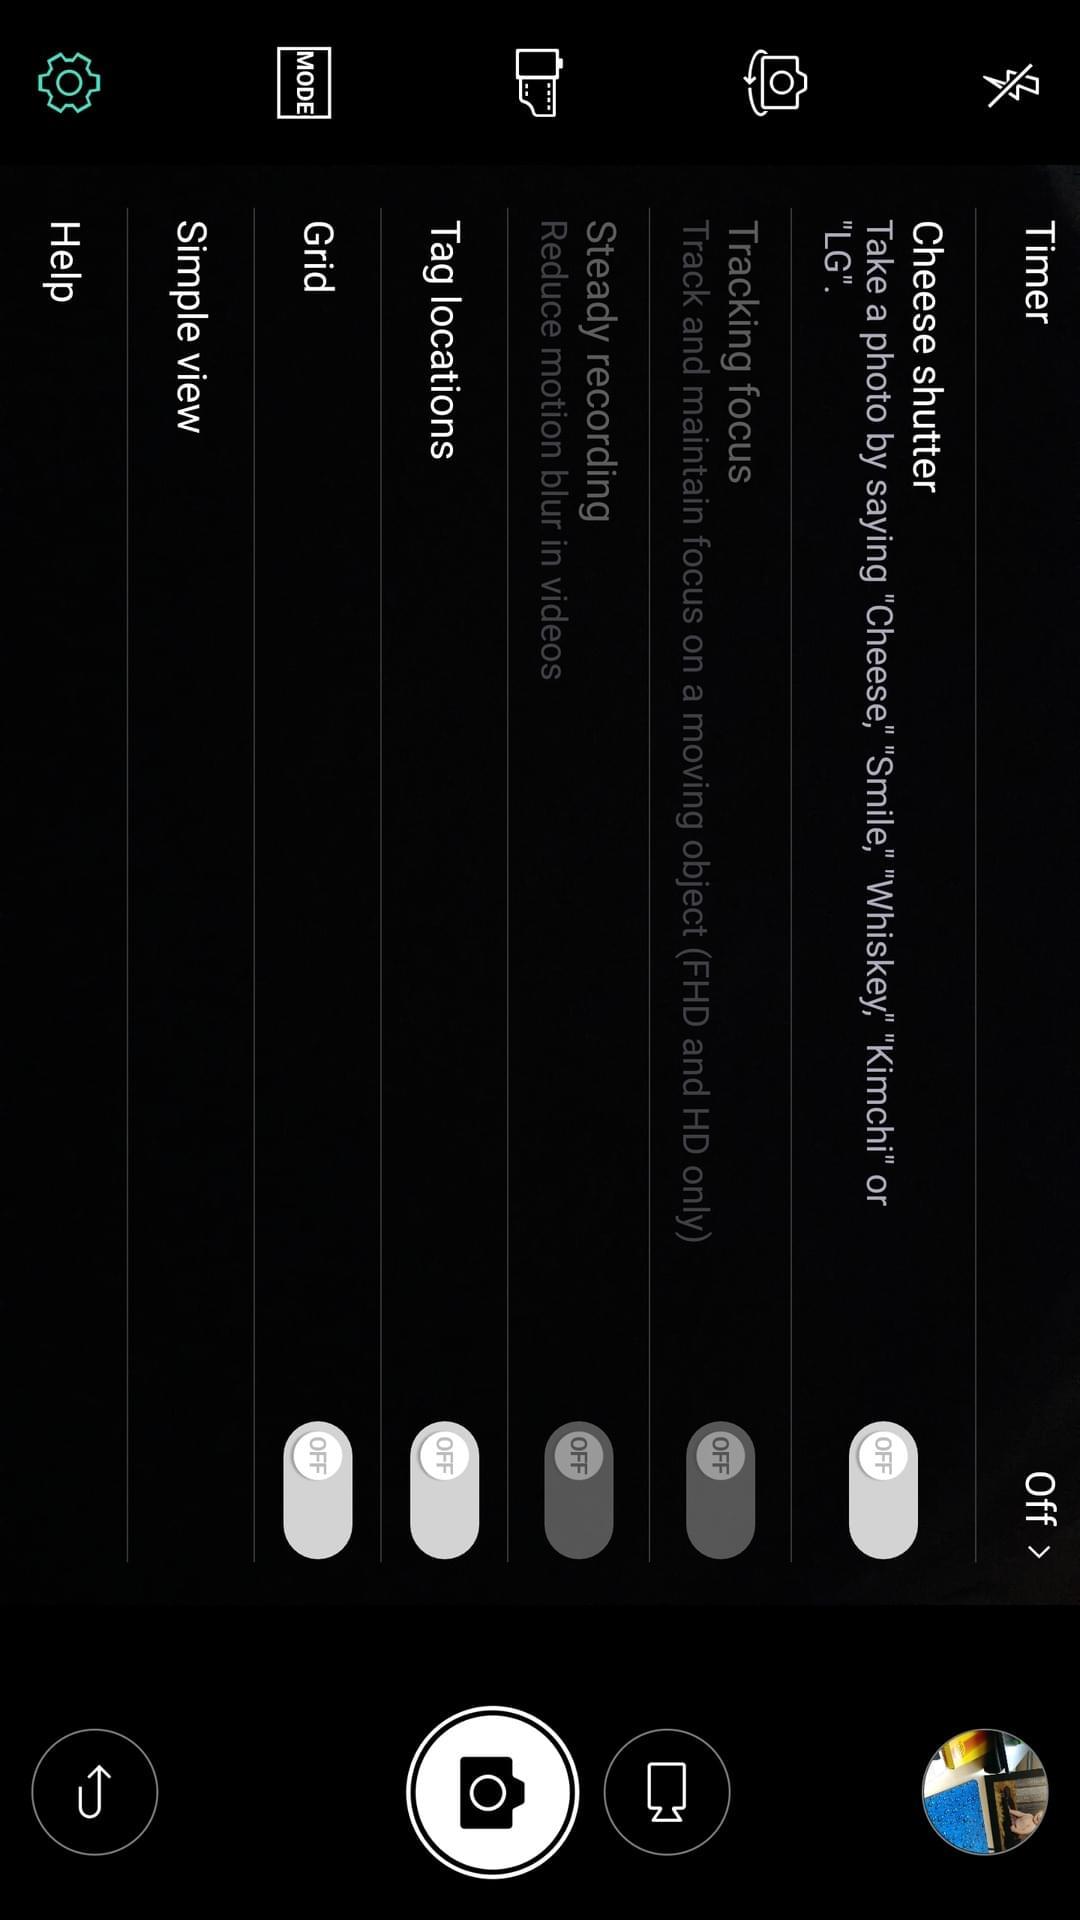 LG V20 AH NS screenshots camera options 2